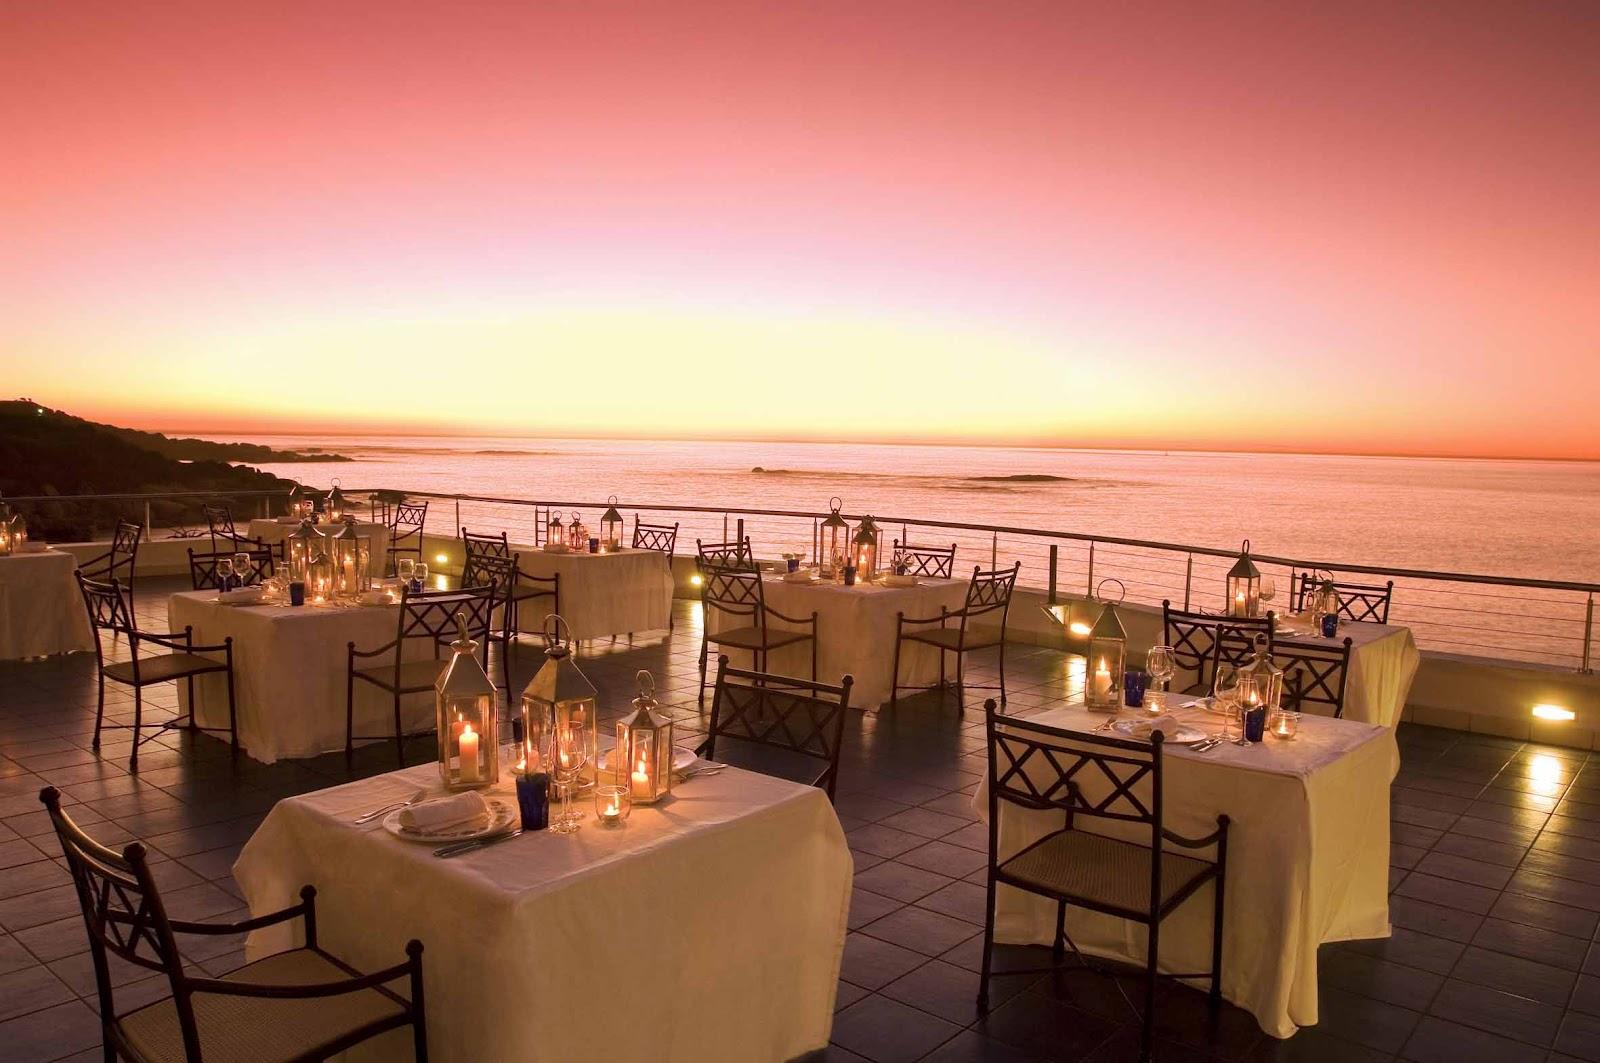 Best Romantic Restaurants In Laguna Beach